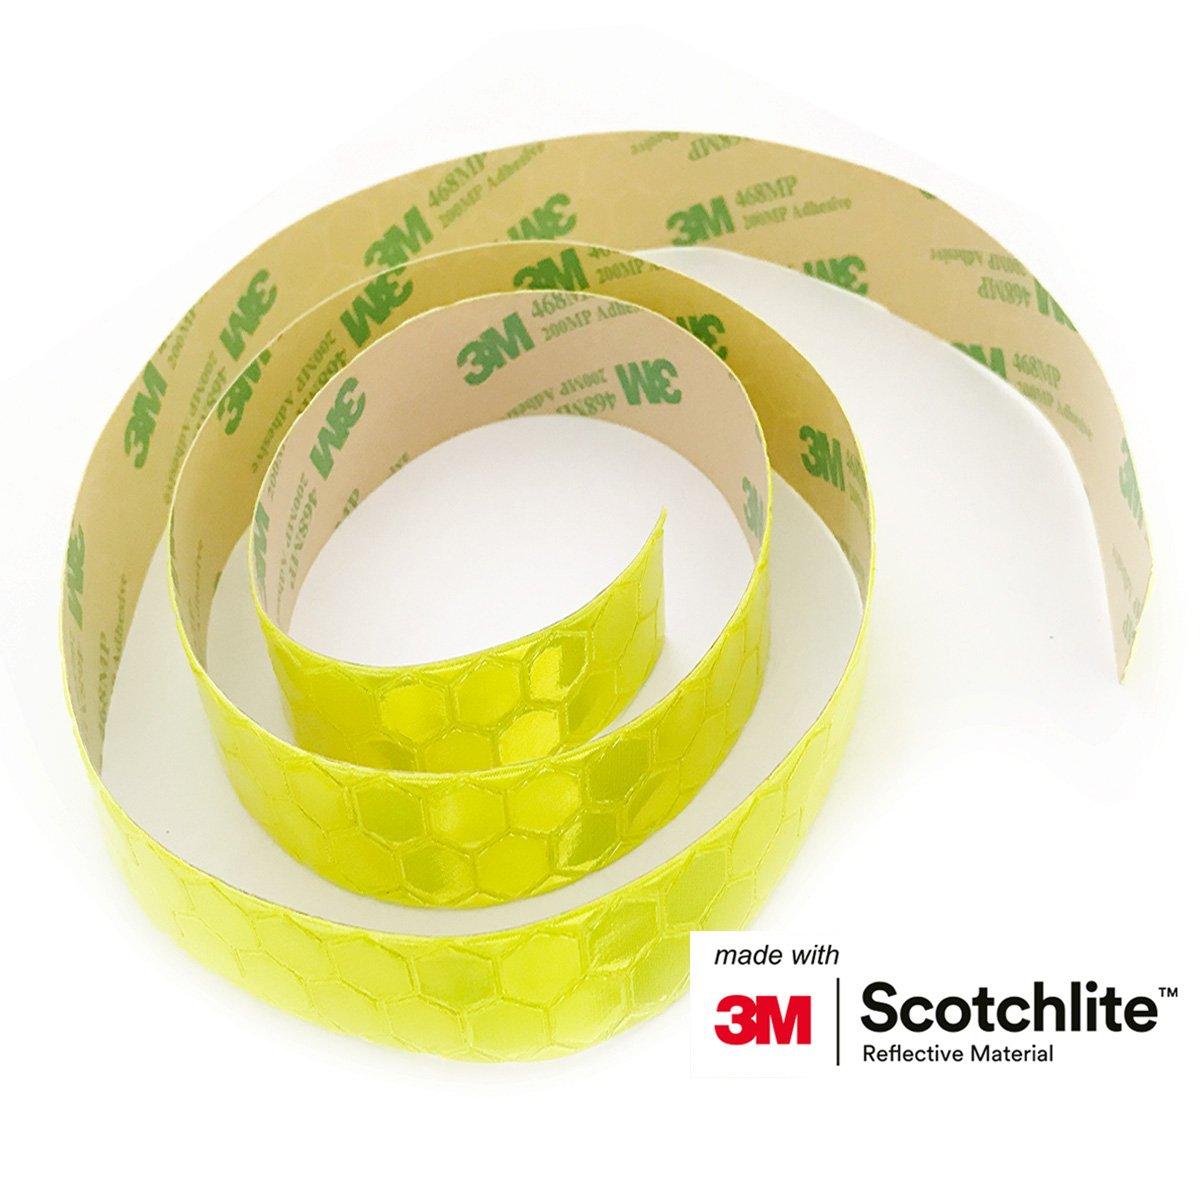 Salzmann 3M Cinta Reflectante, Equipada con 3M Scotchlite, Adhesivo de Alta Visibilidad para Mochilas, Bicicletas, Cascos, Cajas de almacenaje, ...